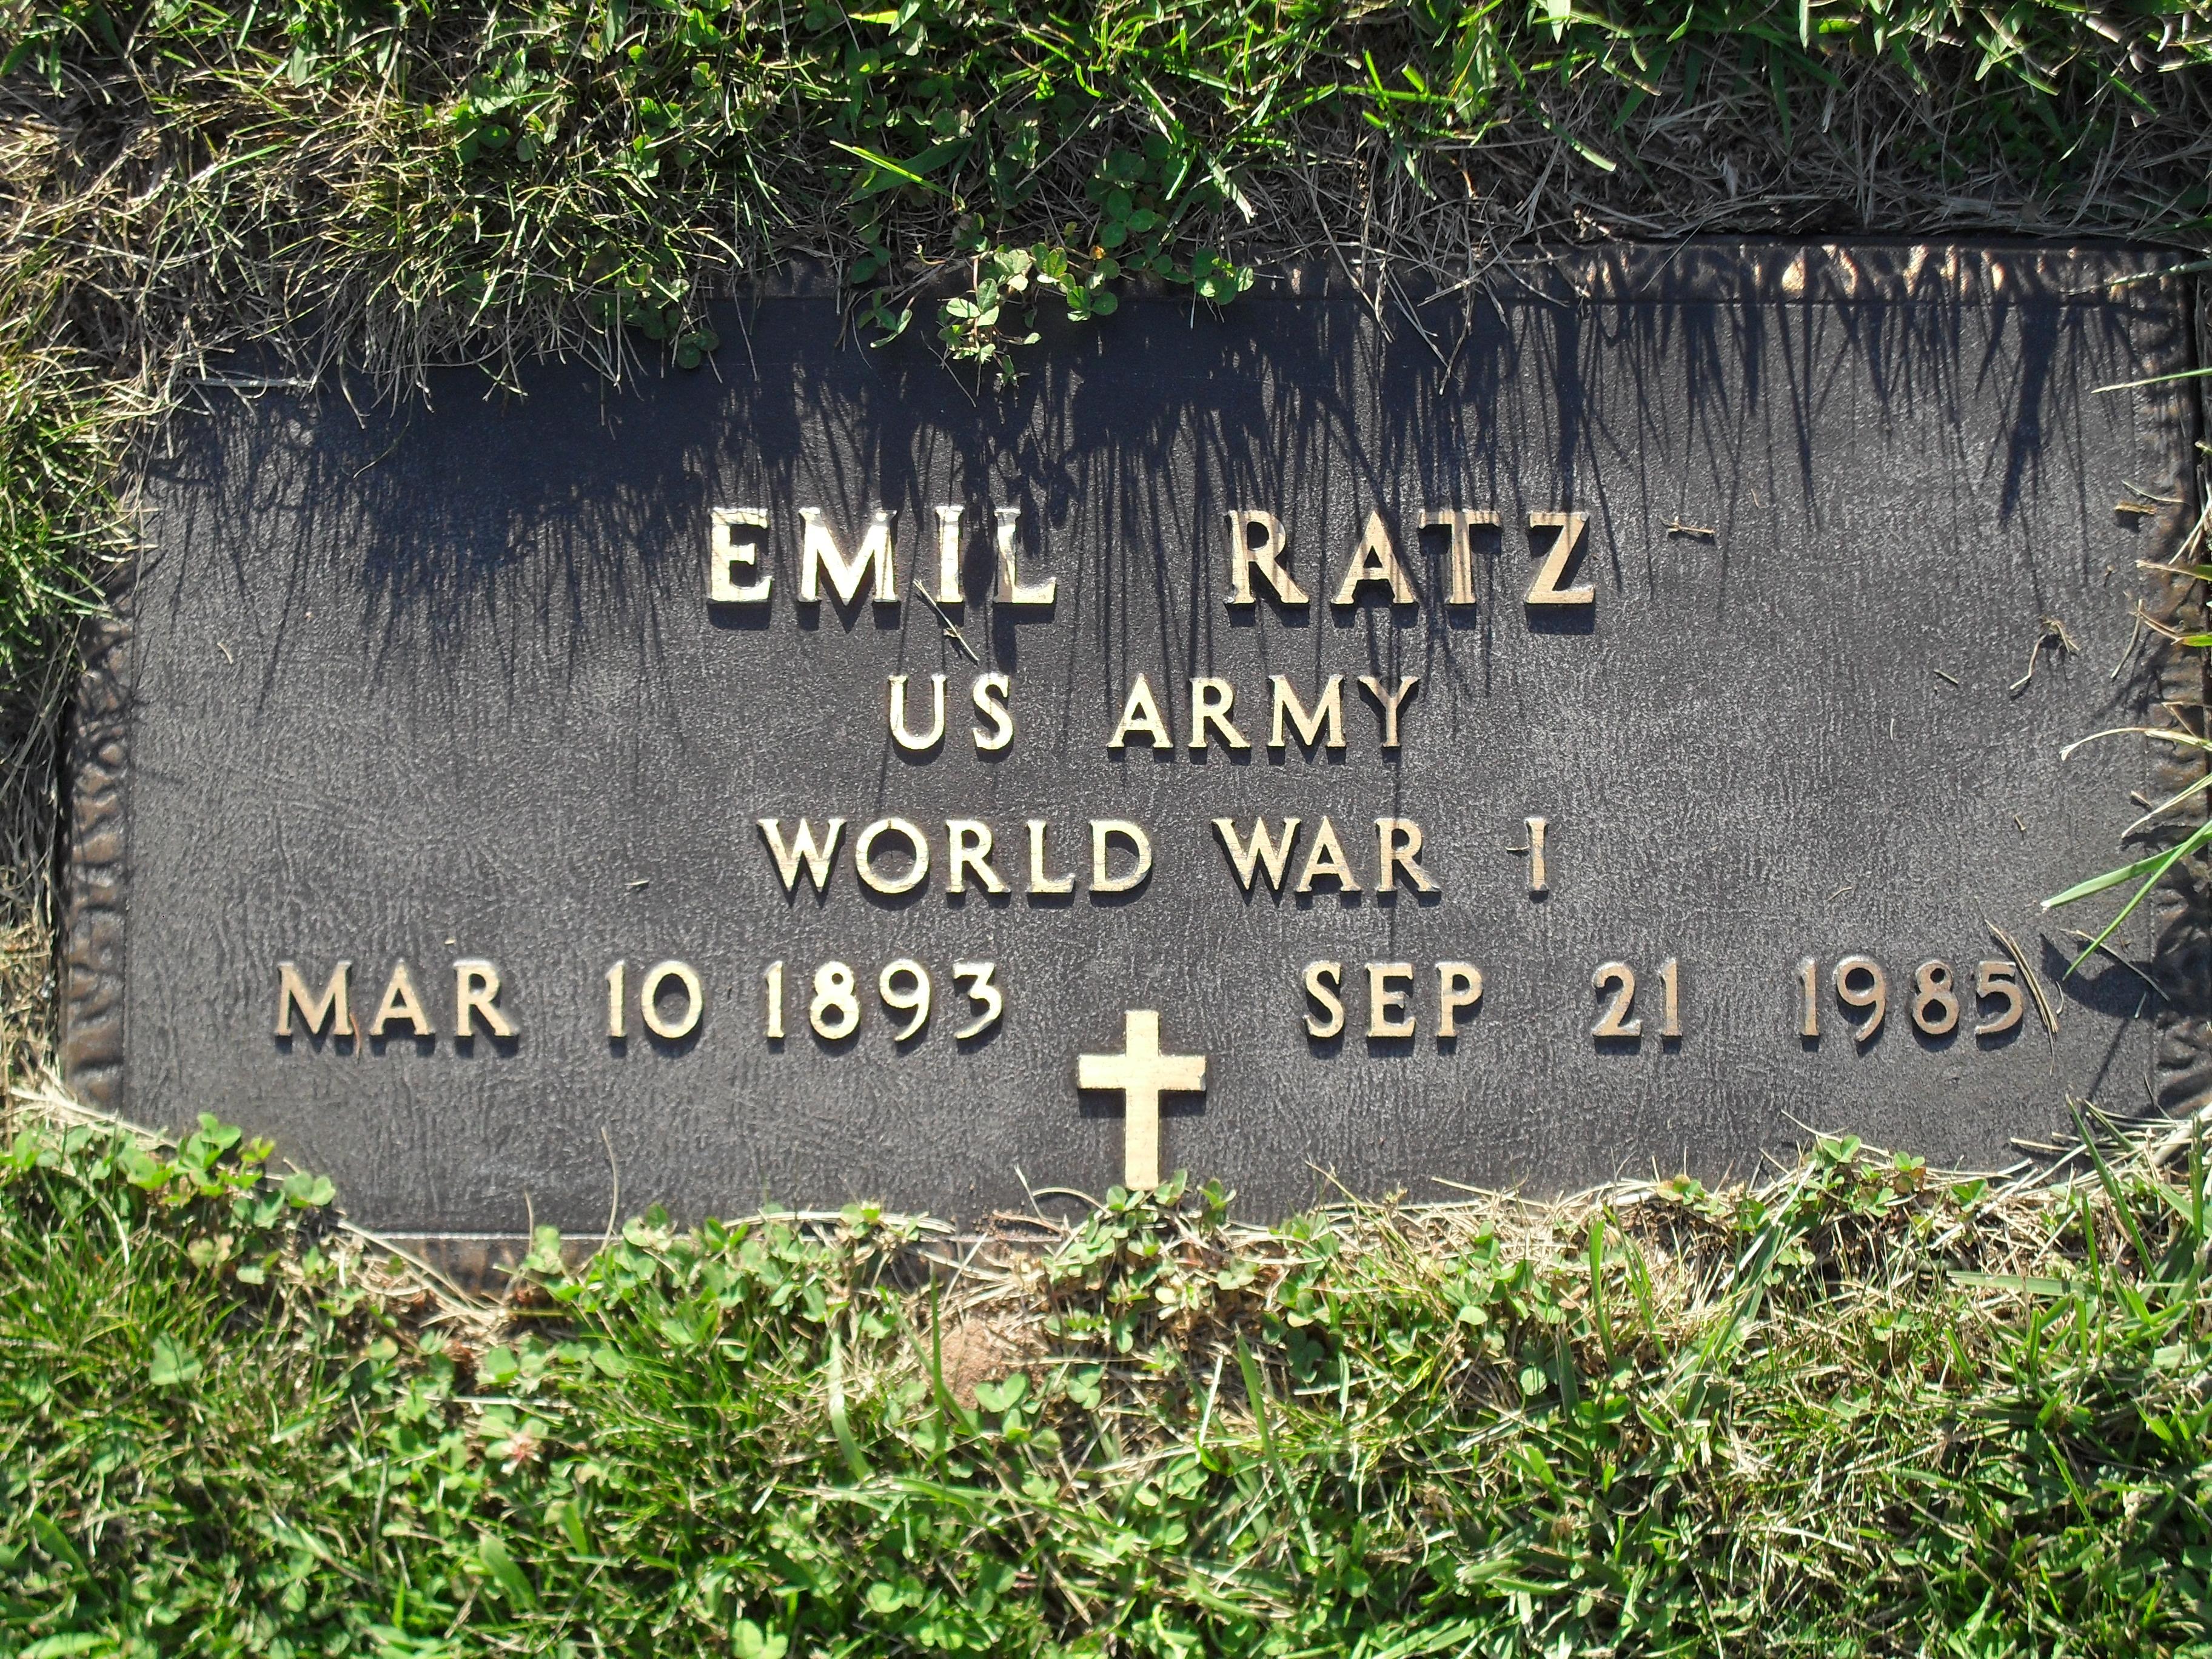 Emil Ratz